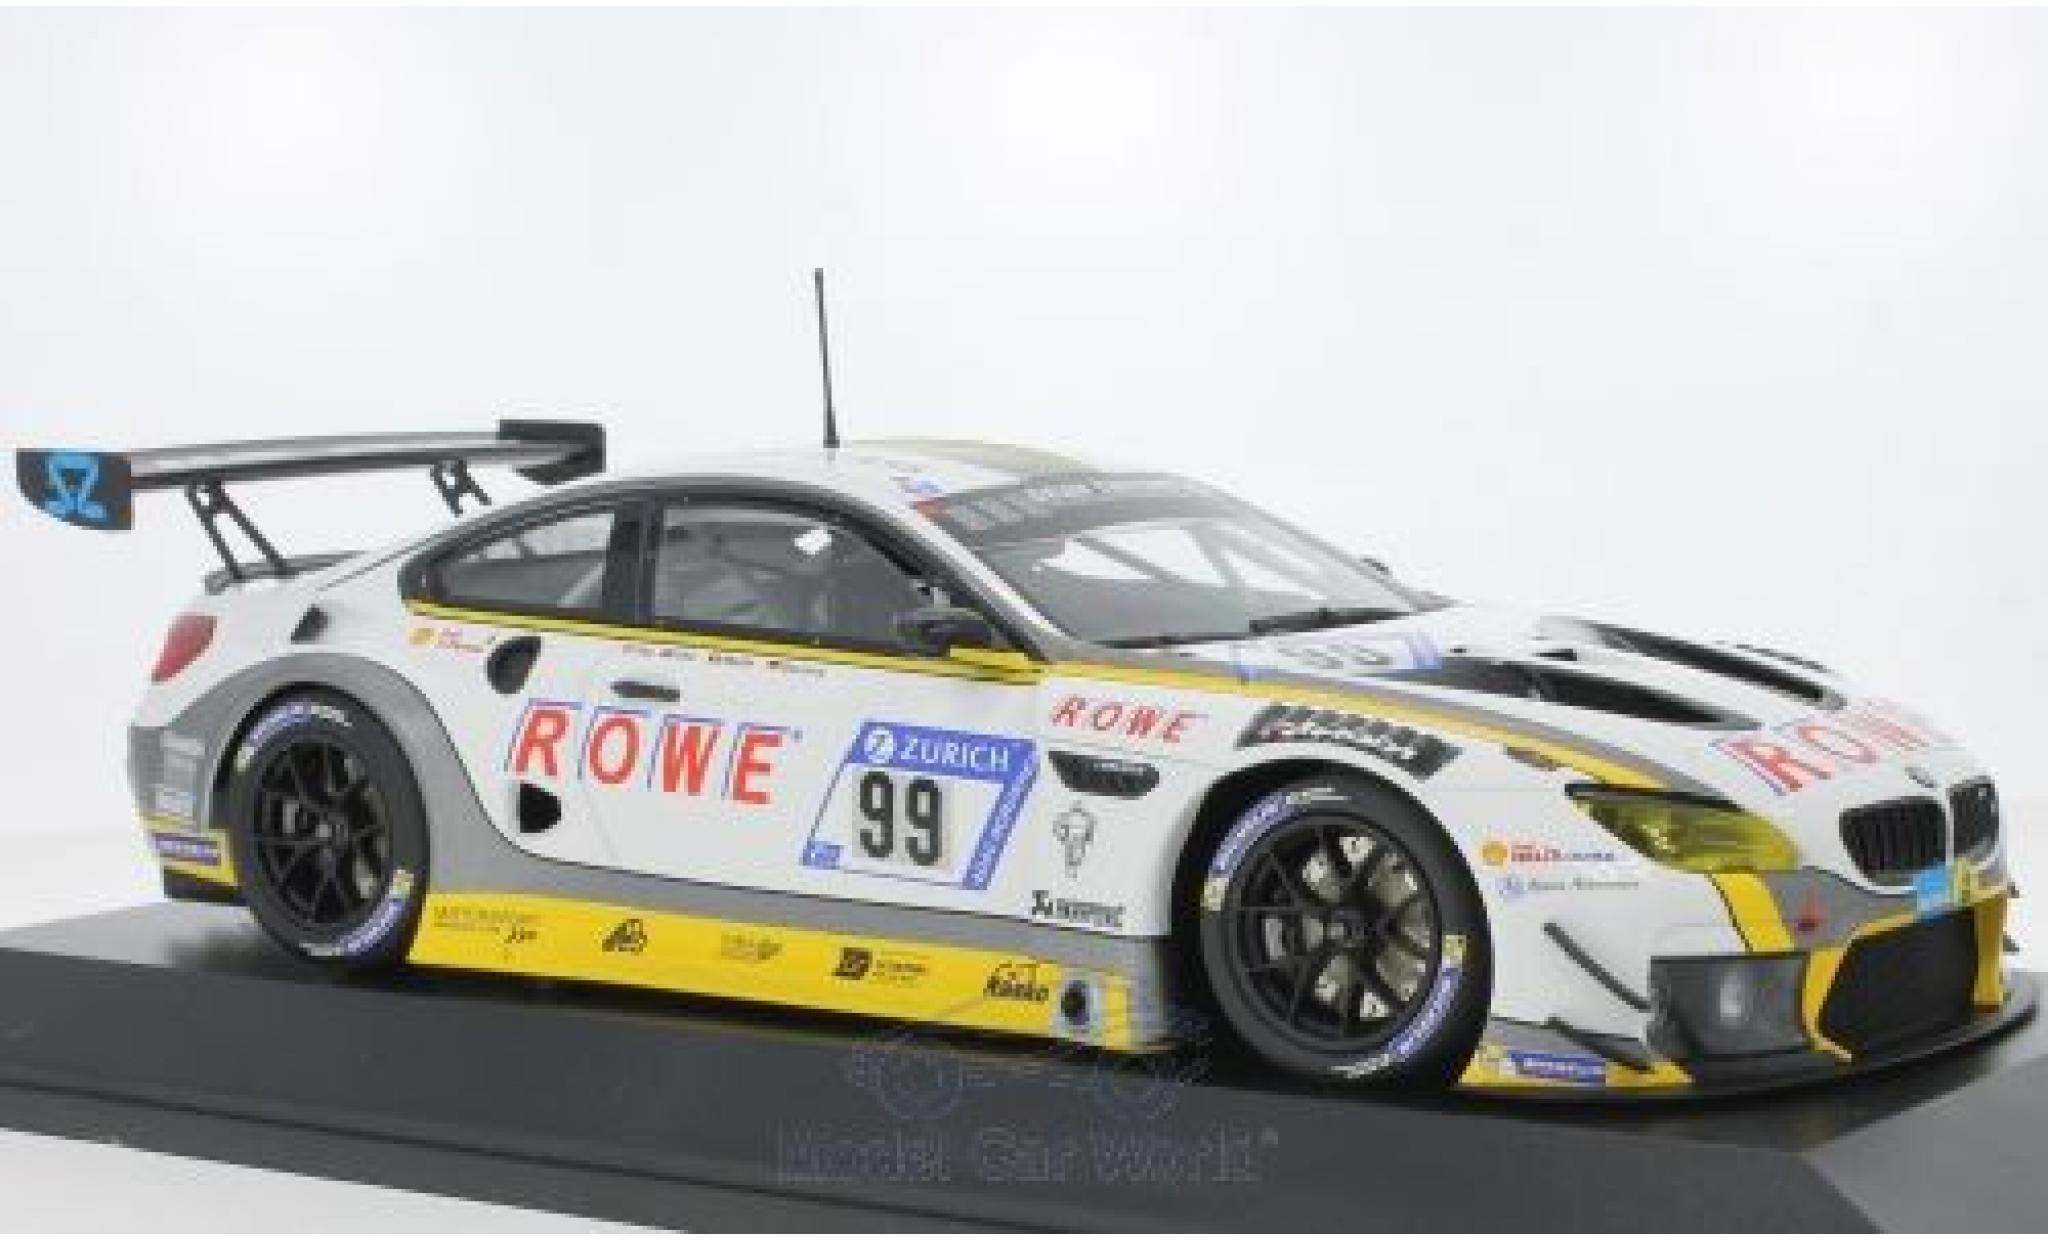 Bmw M6 1/18 Minichamps GT3 No.99 Rowe Racing 24h Nürburgring 2017 P.Eng/A.Sims/M.Martin/M.Basseng